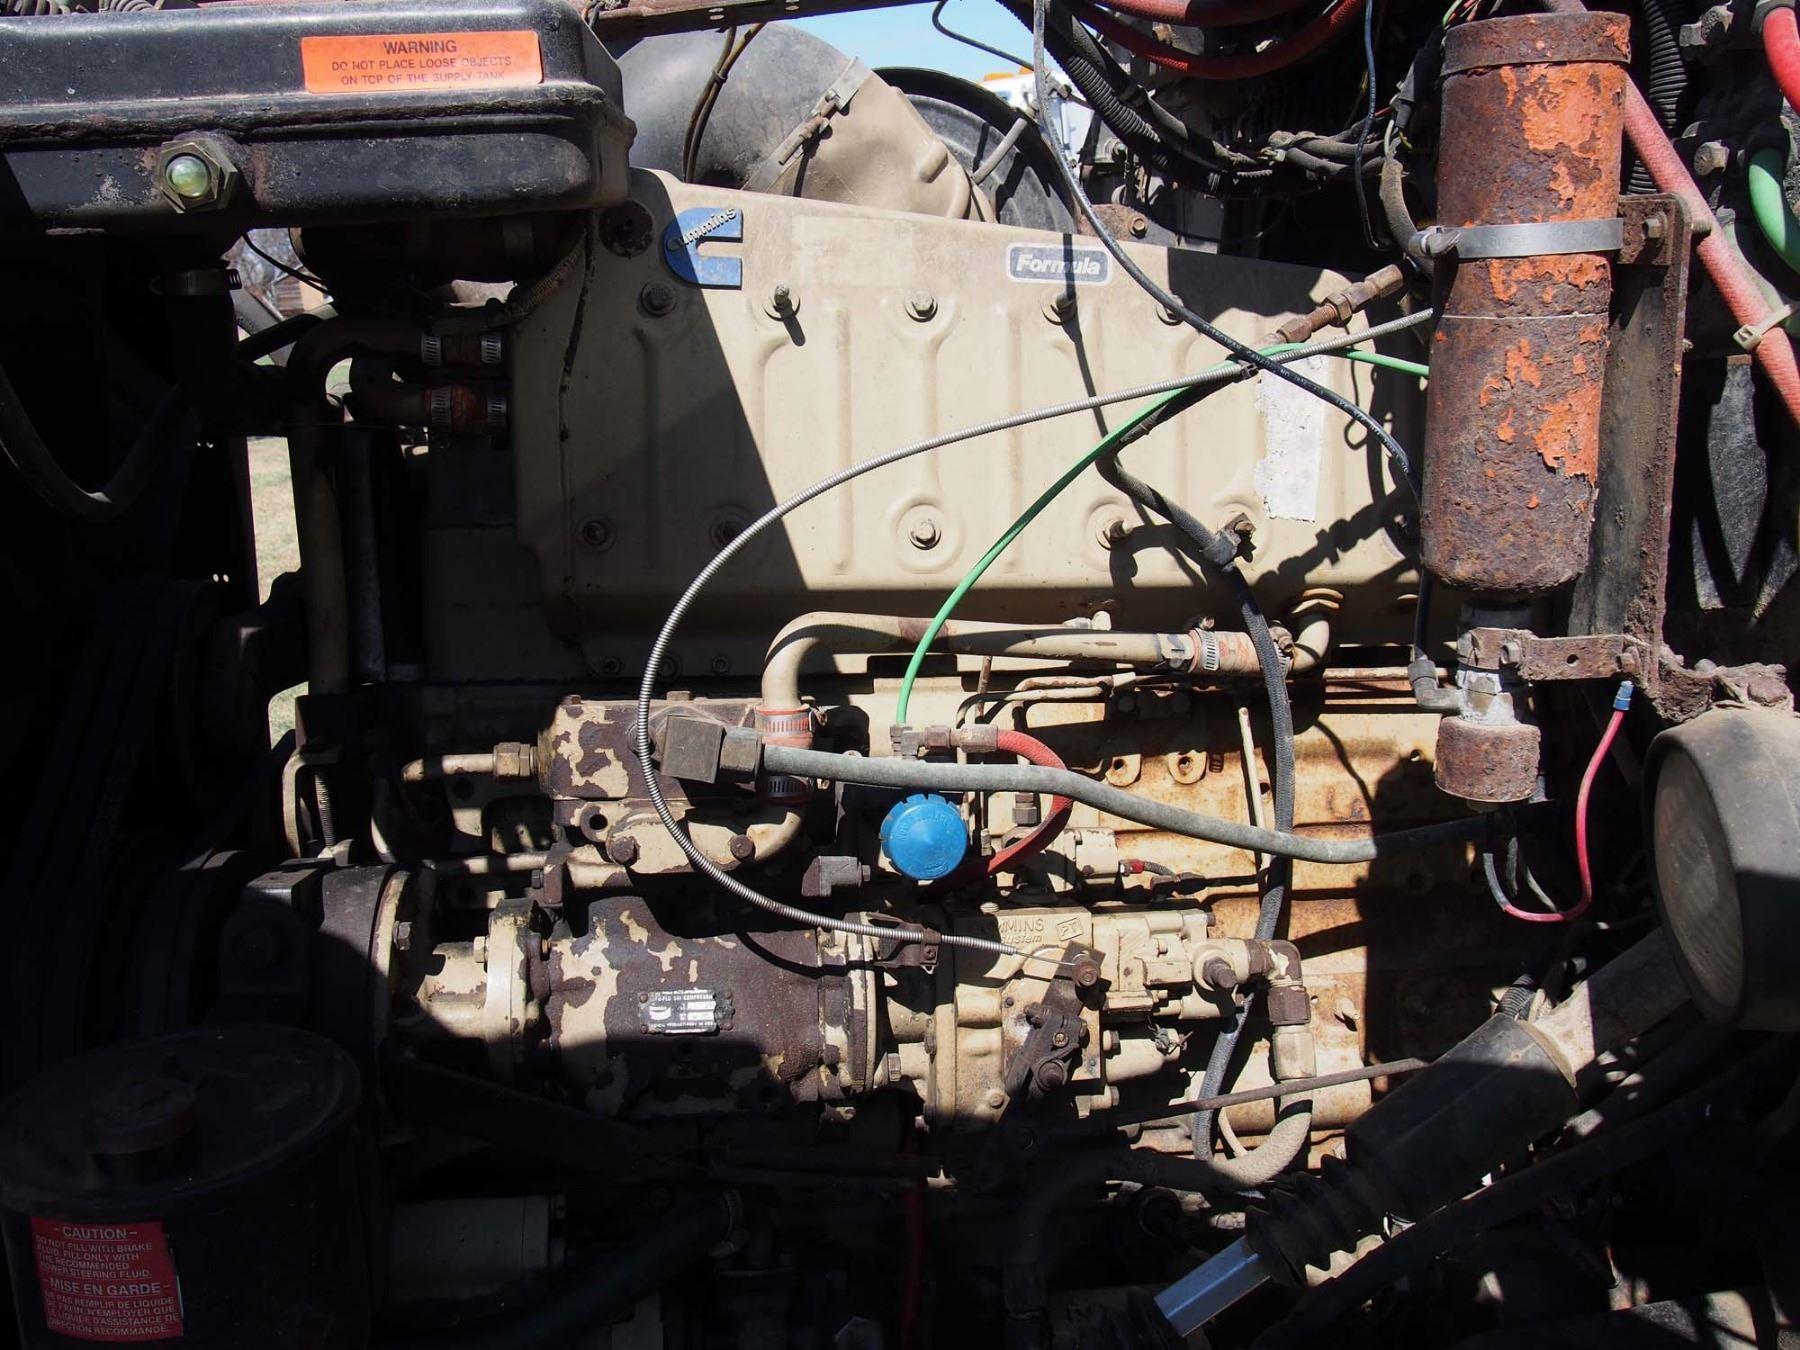 [CSDW_4250]   NF_1940] 1989 Ford L9000 Wiring Diagram Schematic Wiring | Ford Lt9000 Starter Wiring |  | Hone Puti Ixtu Nowa Orsal Emba Mohammedshrine Librar Wiring 101